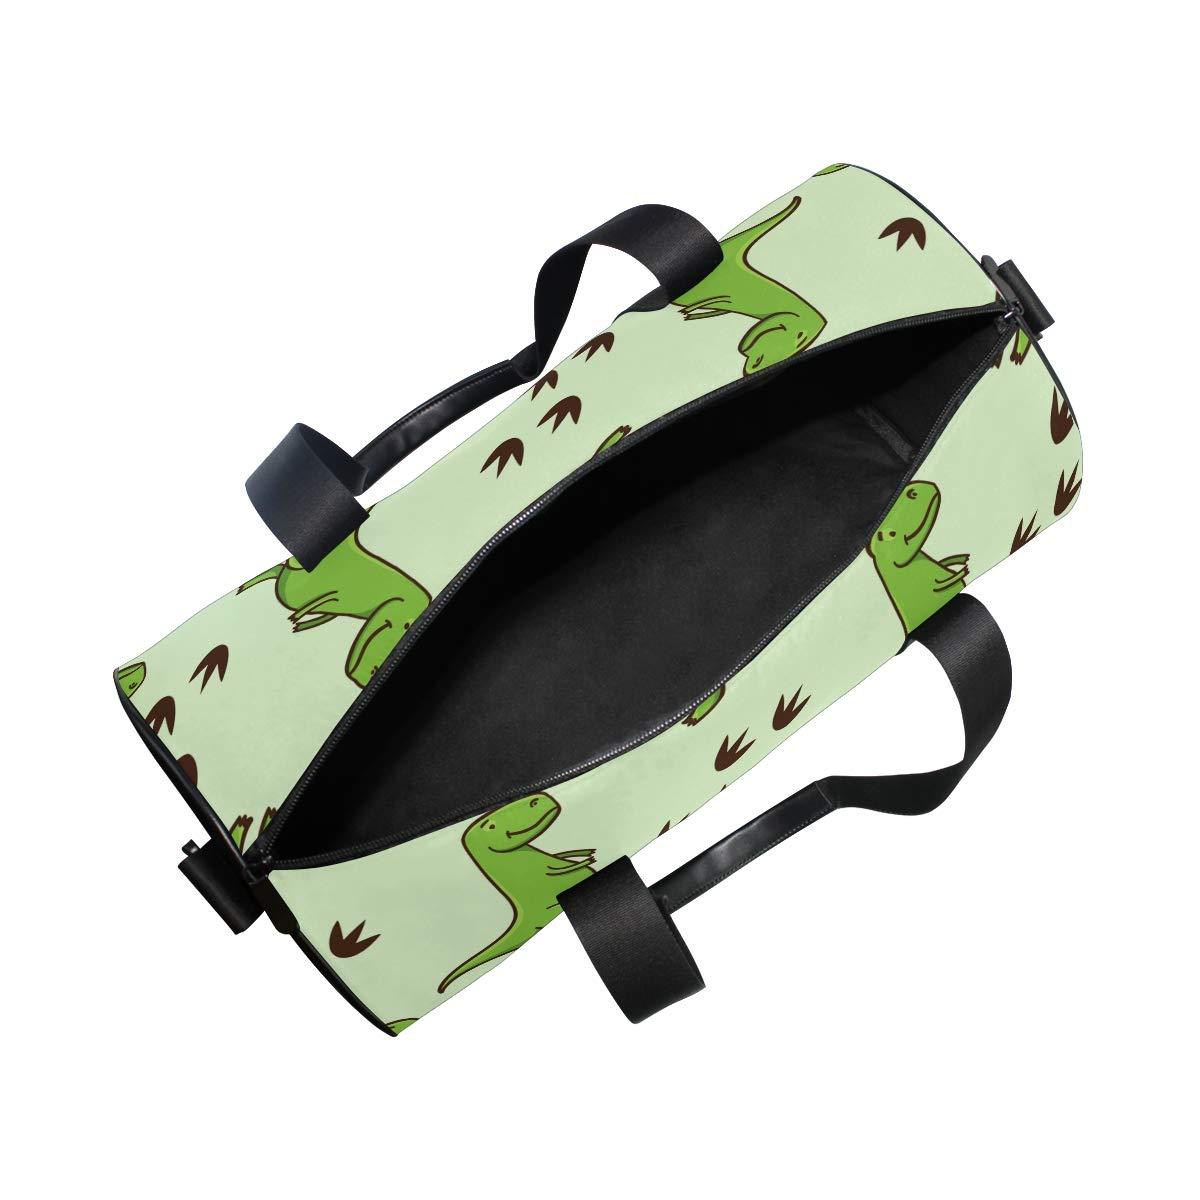 WIHVE Gym Duffel Bag Cute Cartoon Green Dinosaurs Footprints Sports Lightweight Canvas Travel Luggage Bag